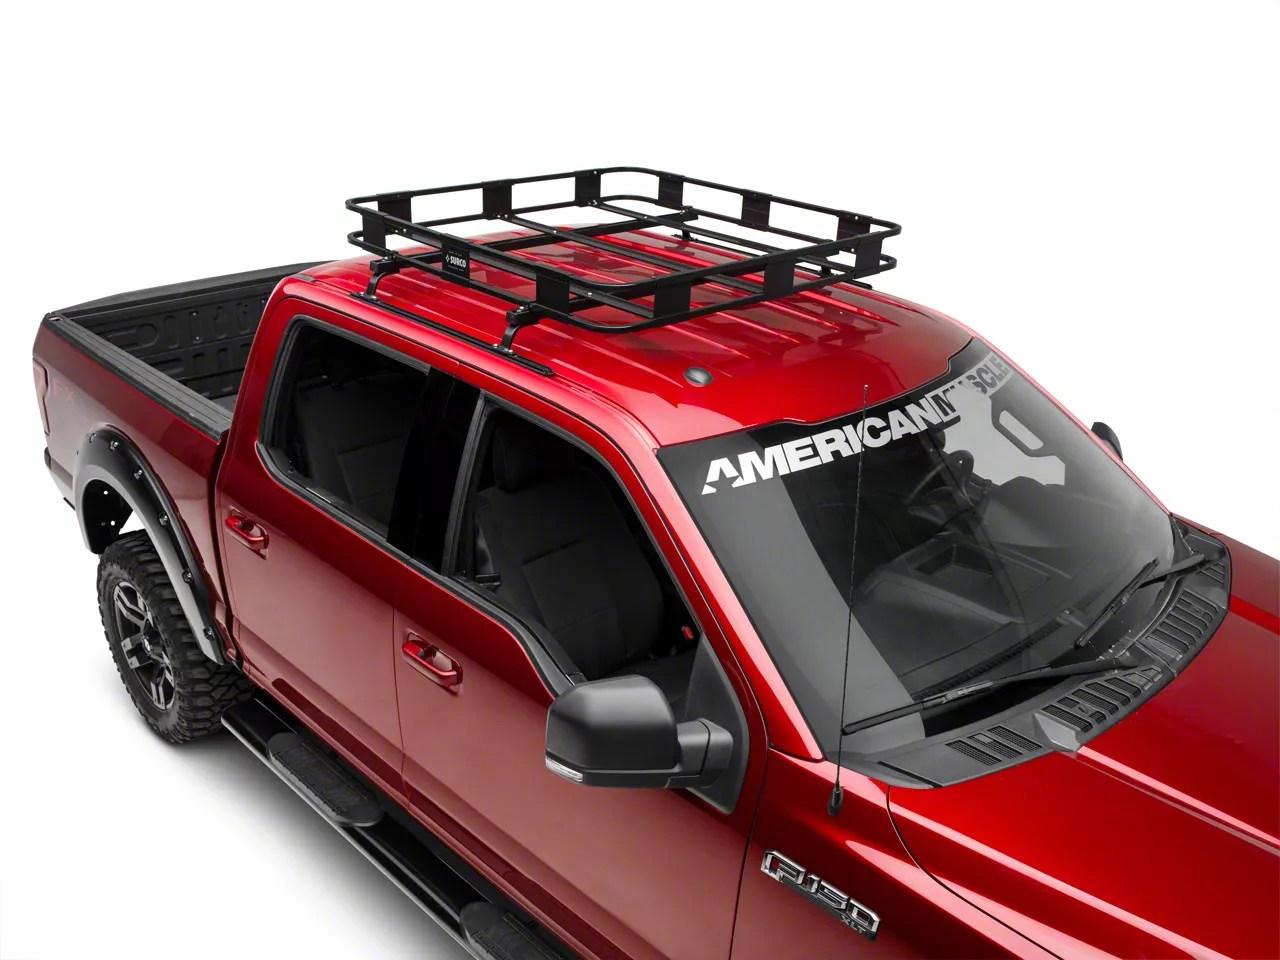 Surco F 150 Safari Roof Rack 50 In X 50 In W 5 In